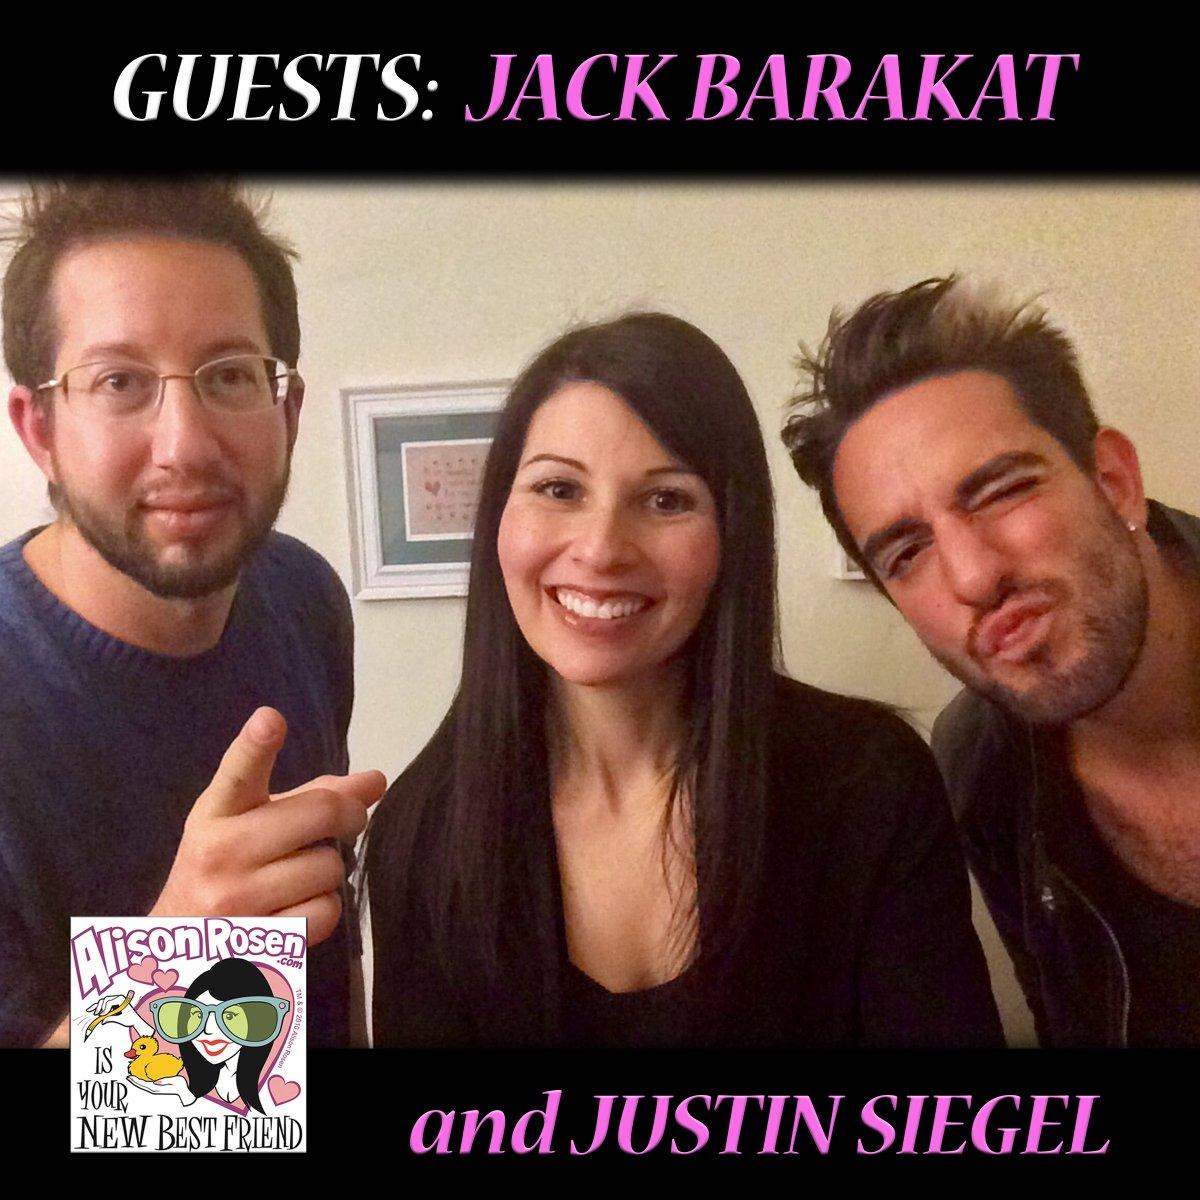 Episode w @jackalltimelow and @justinsiegel is up! Listen at https://t.co/w0UGxfILBE or https://t.co/FkAp0cH3Nb https://t.co/gpQ6P9CyoM